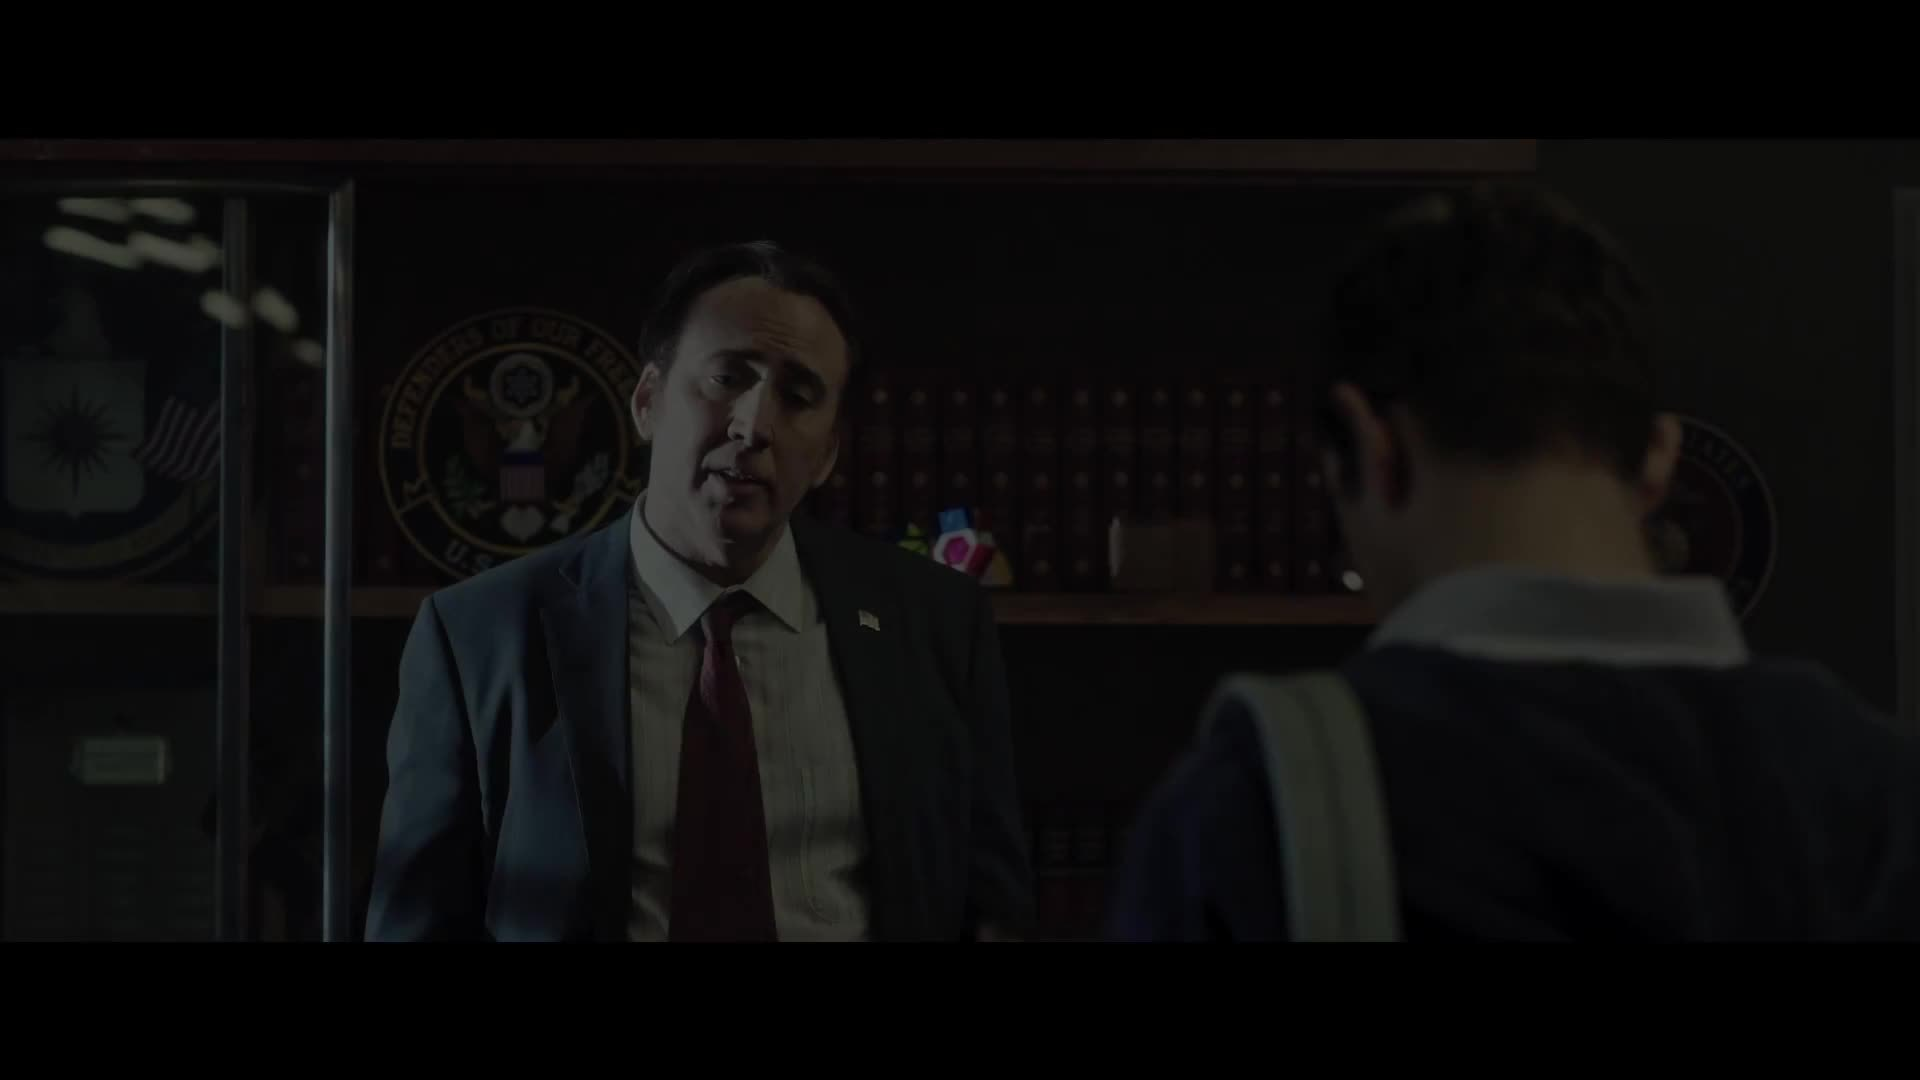 onetruegod, SNOWDEN - Official Trailer GIFs